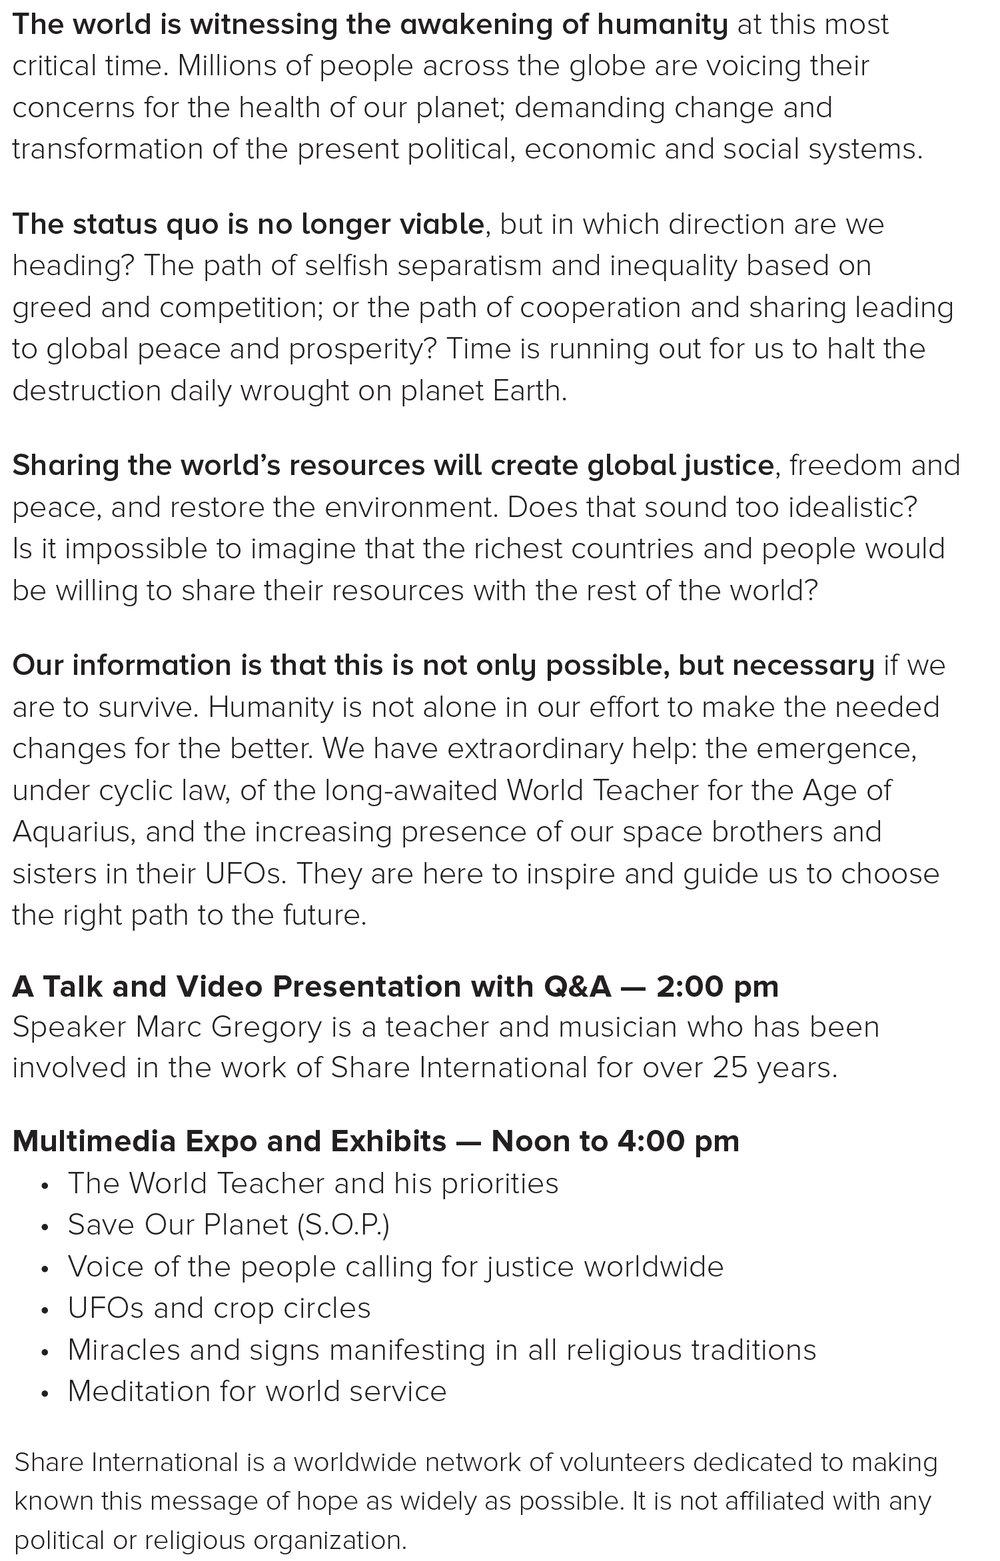 Share_International_Talk_and_Expo-2.jpg